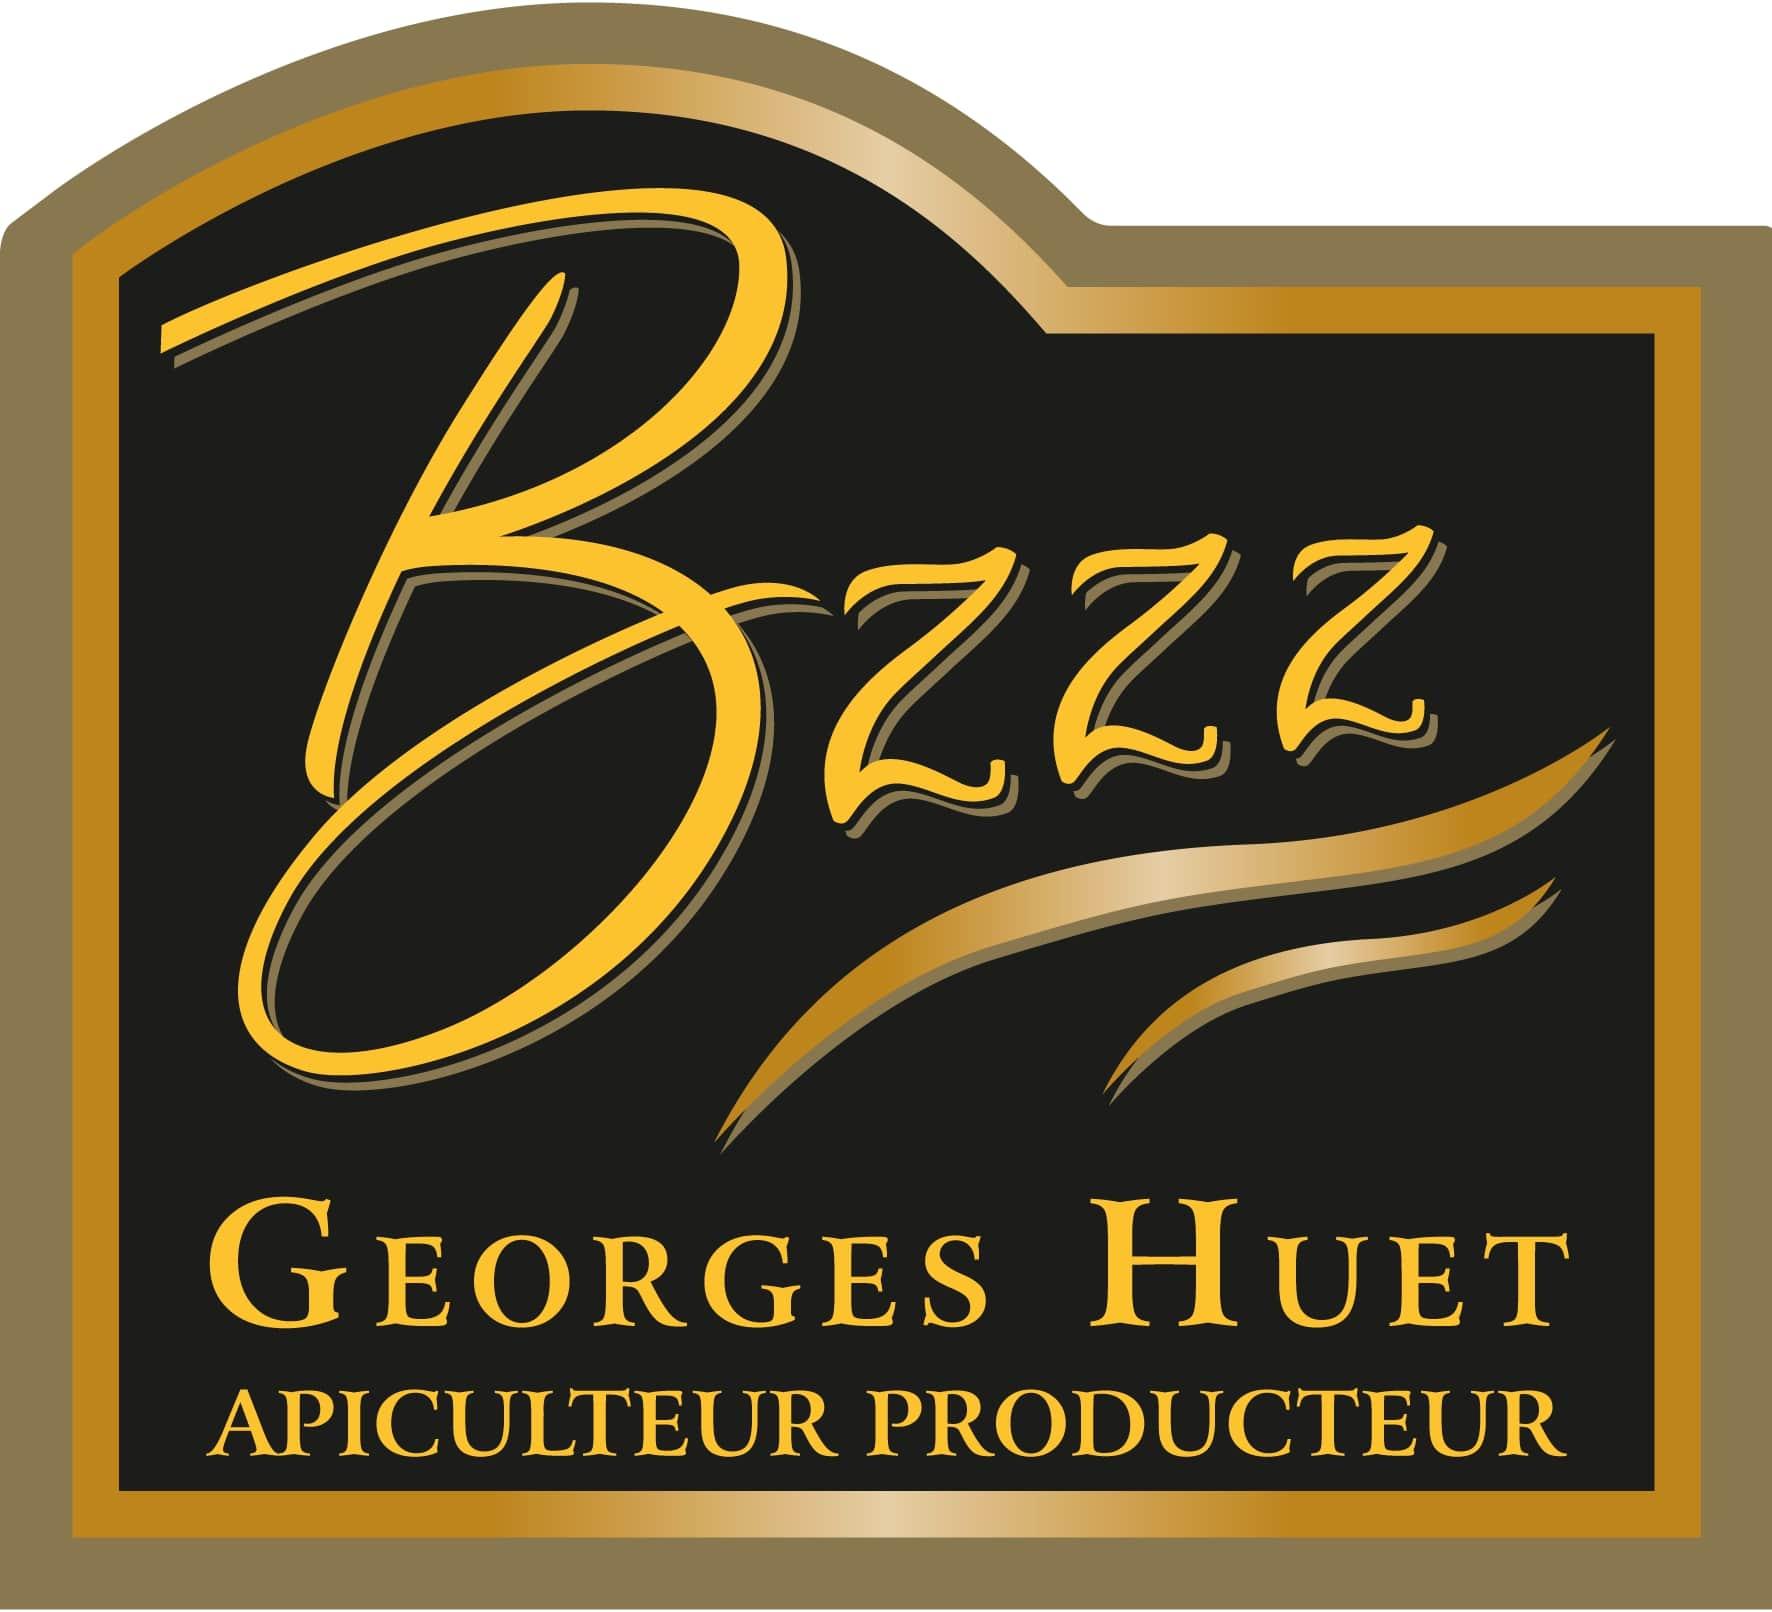 Dracénie Provence Verdon Agglomération - Georges Huet